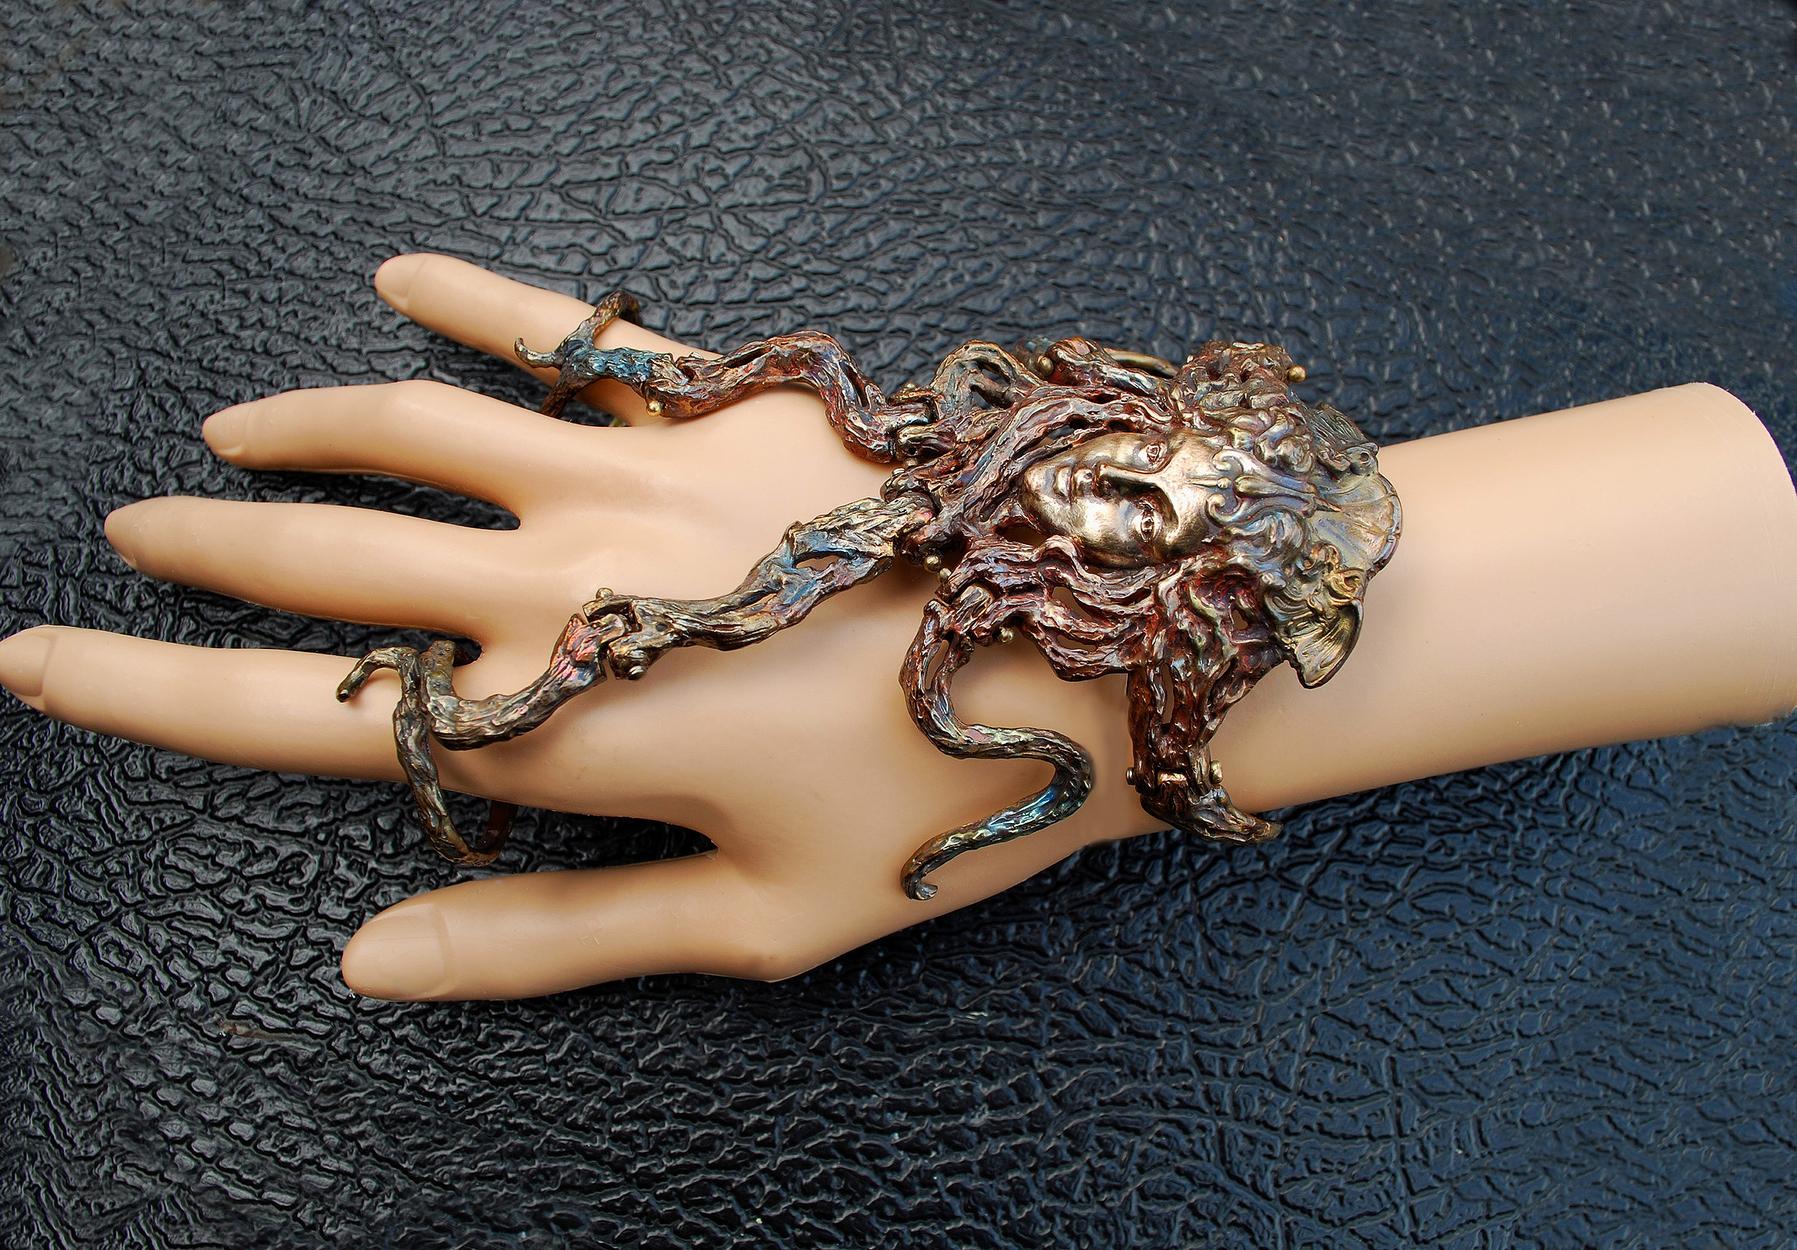 Medusa's Dream Artwork by Michelle Robison